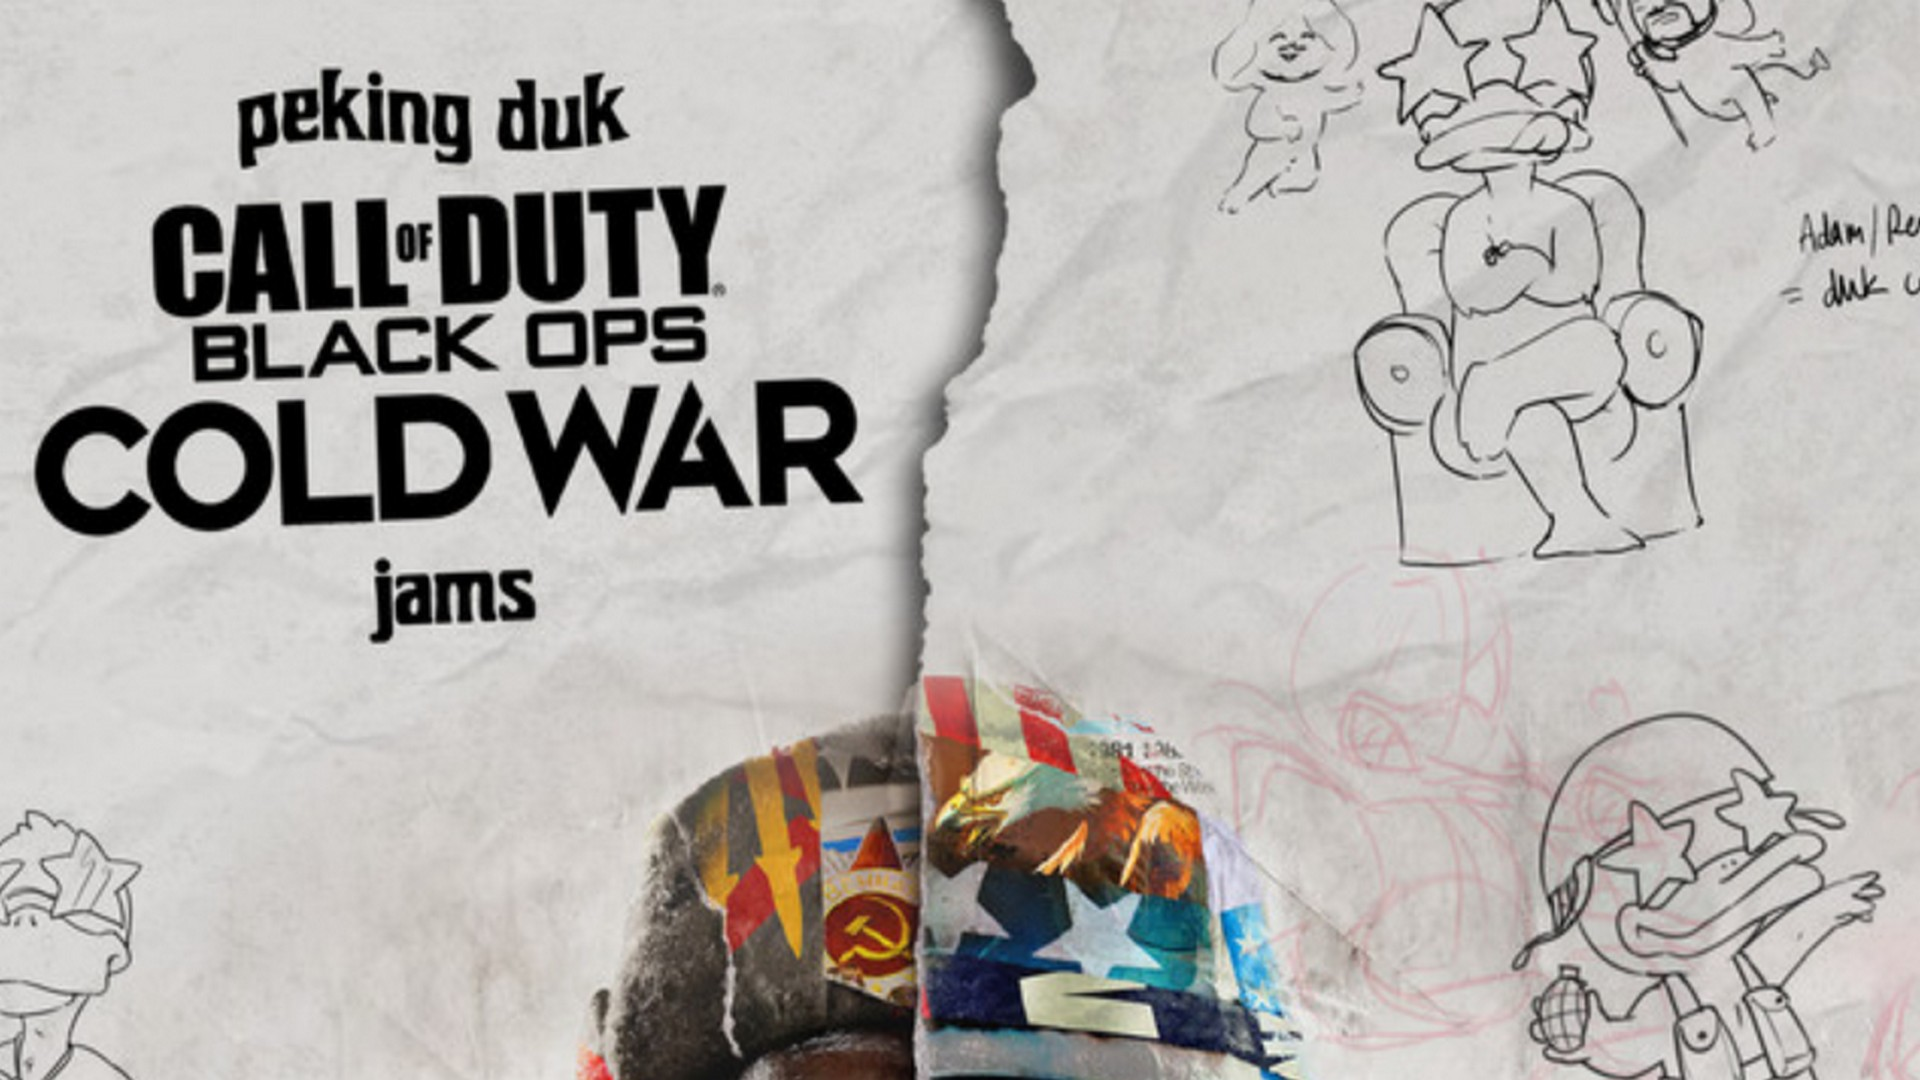 Peking Duk's Epic Call of Duty: Black Ops Cold War Jams